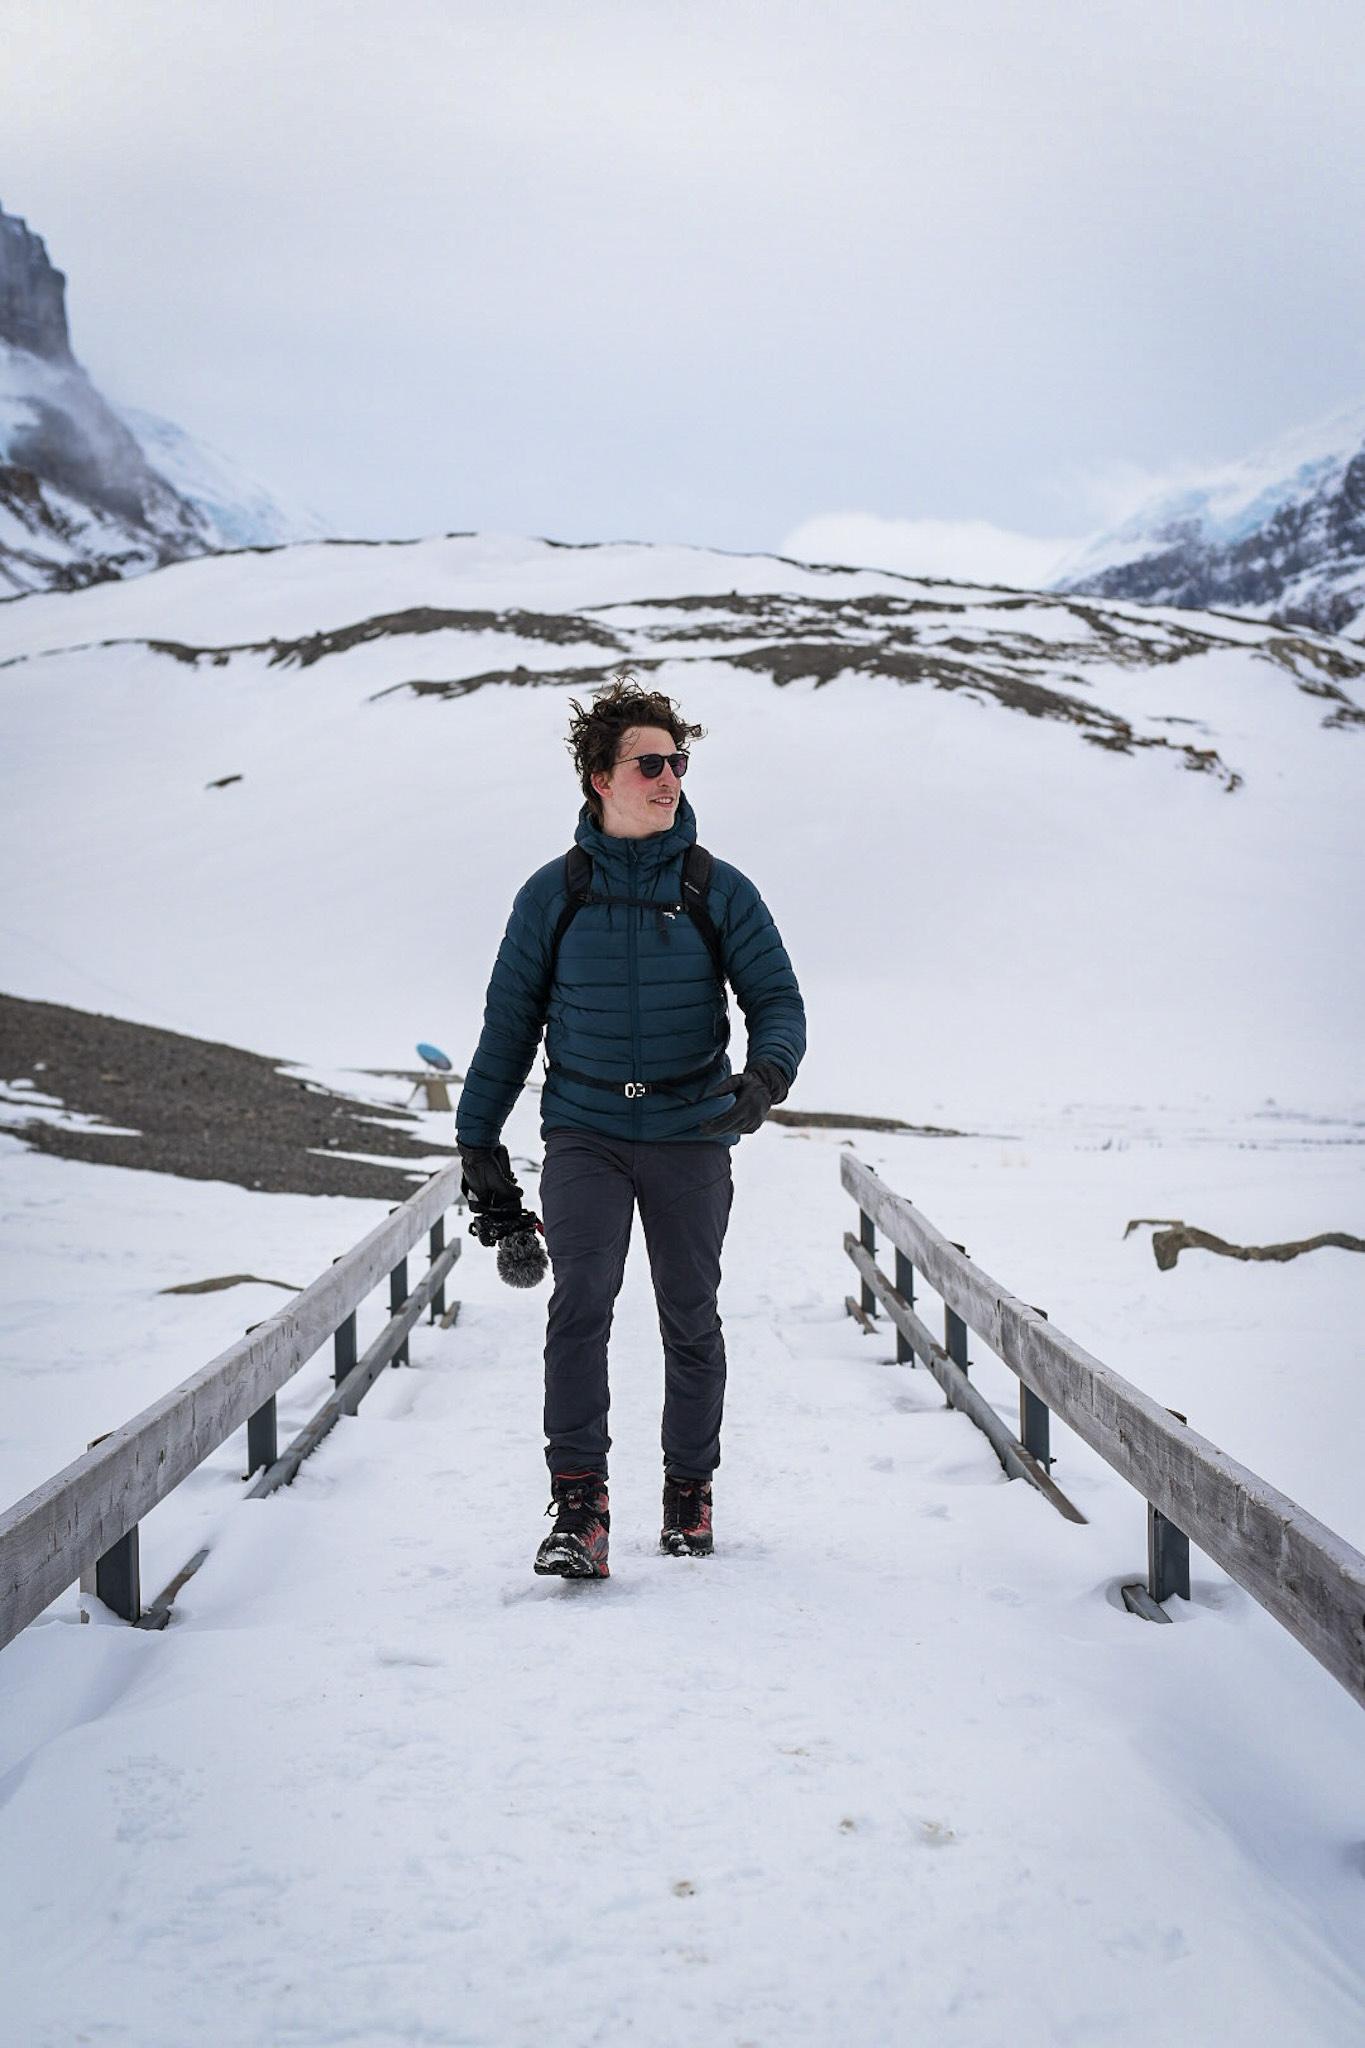 Ian Ladd walking along a bridge near a glacier. Holding his camera in his right hand.